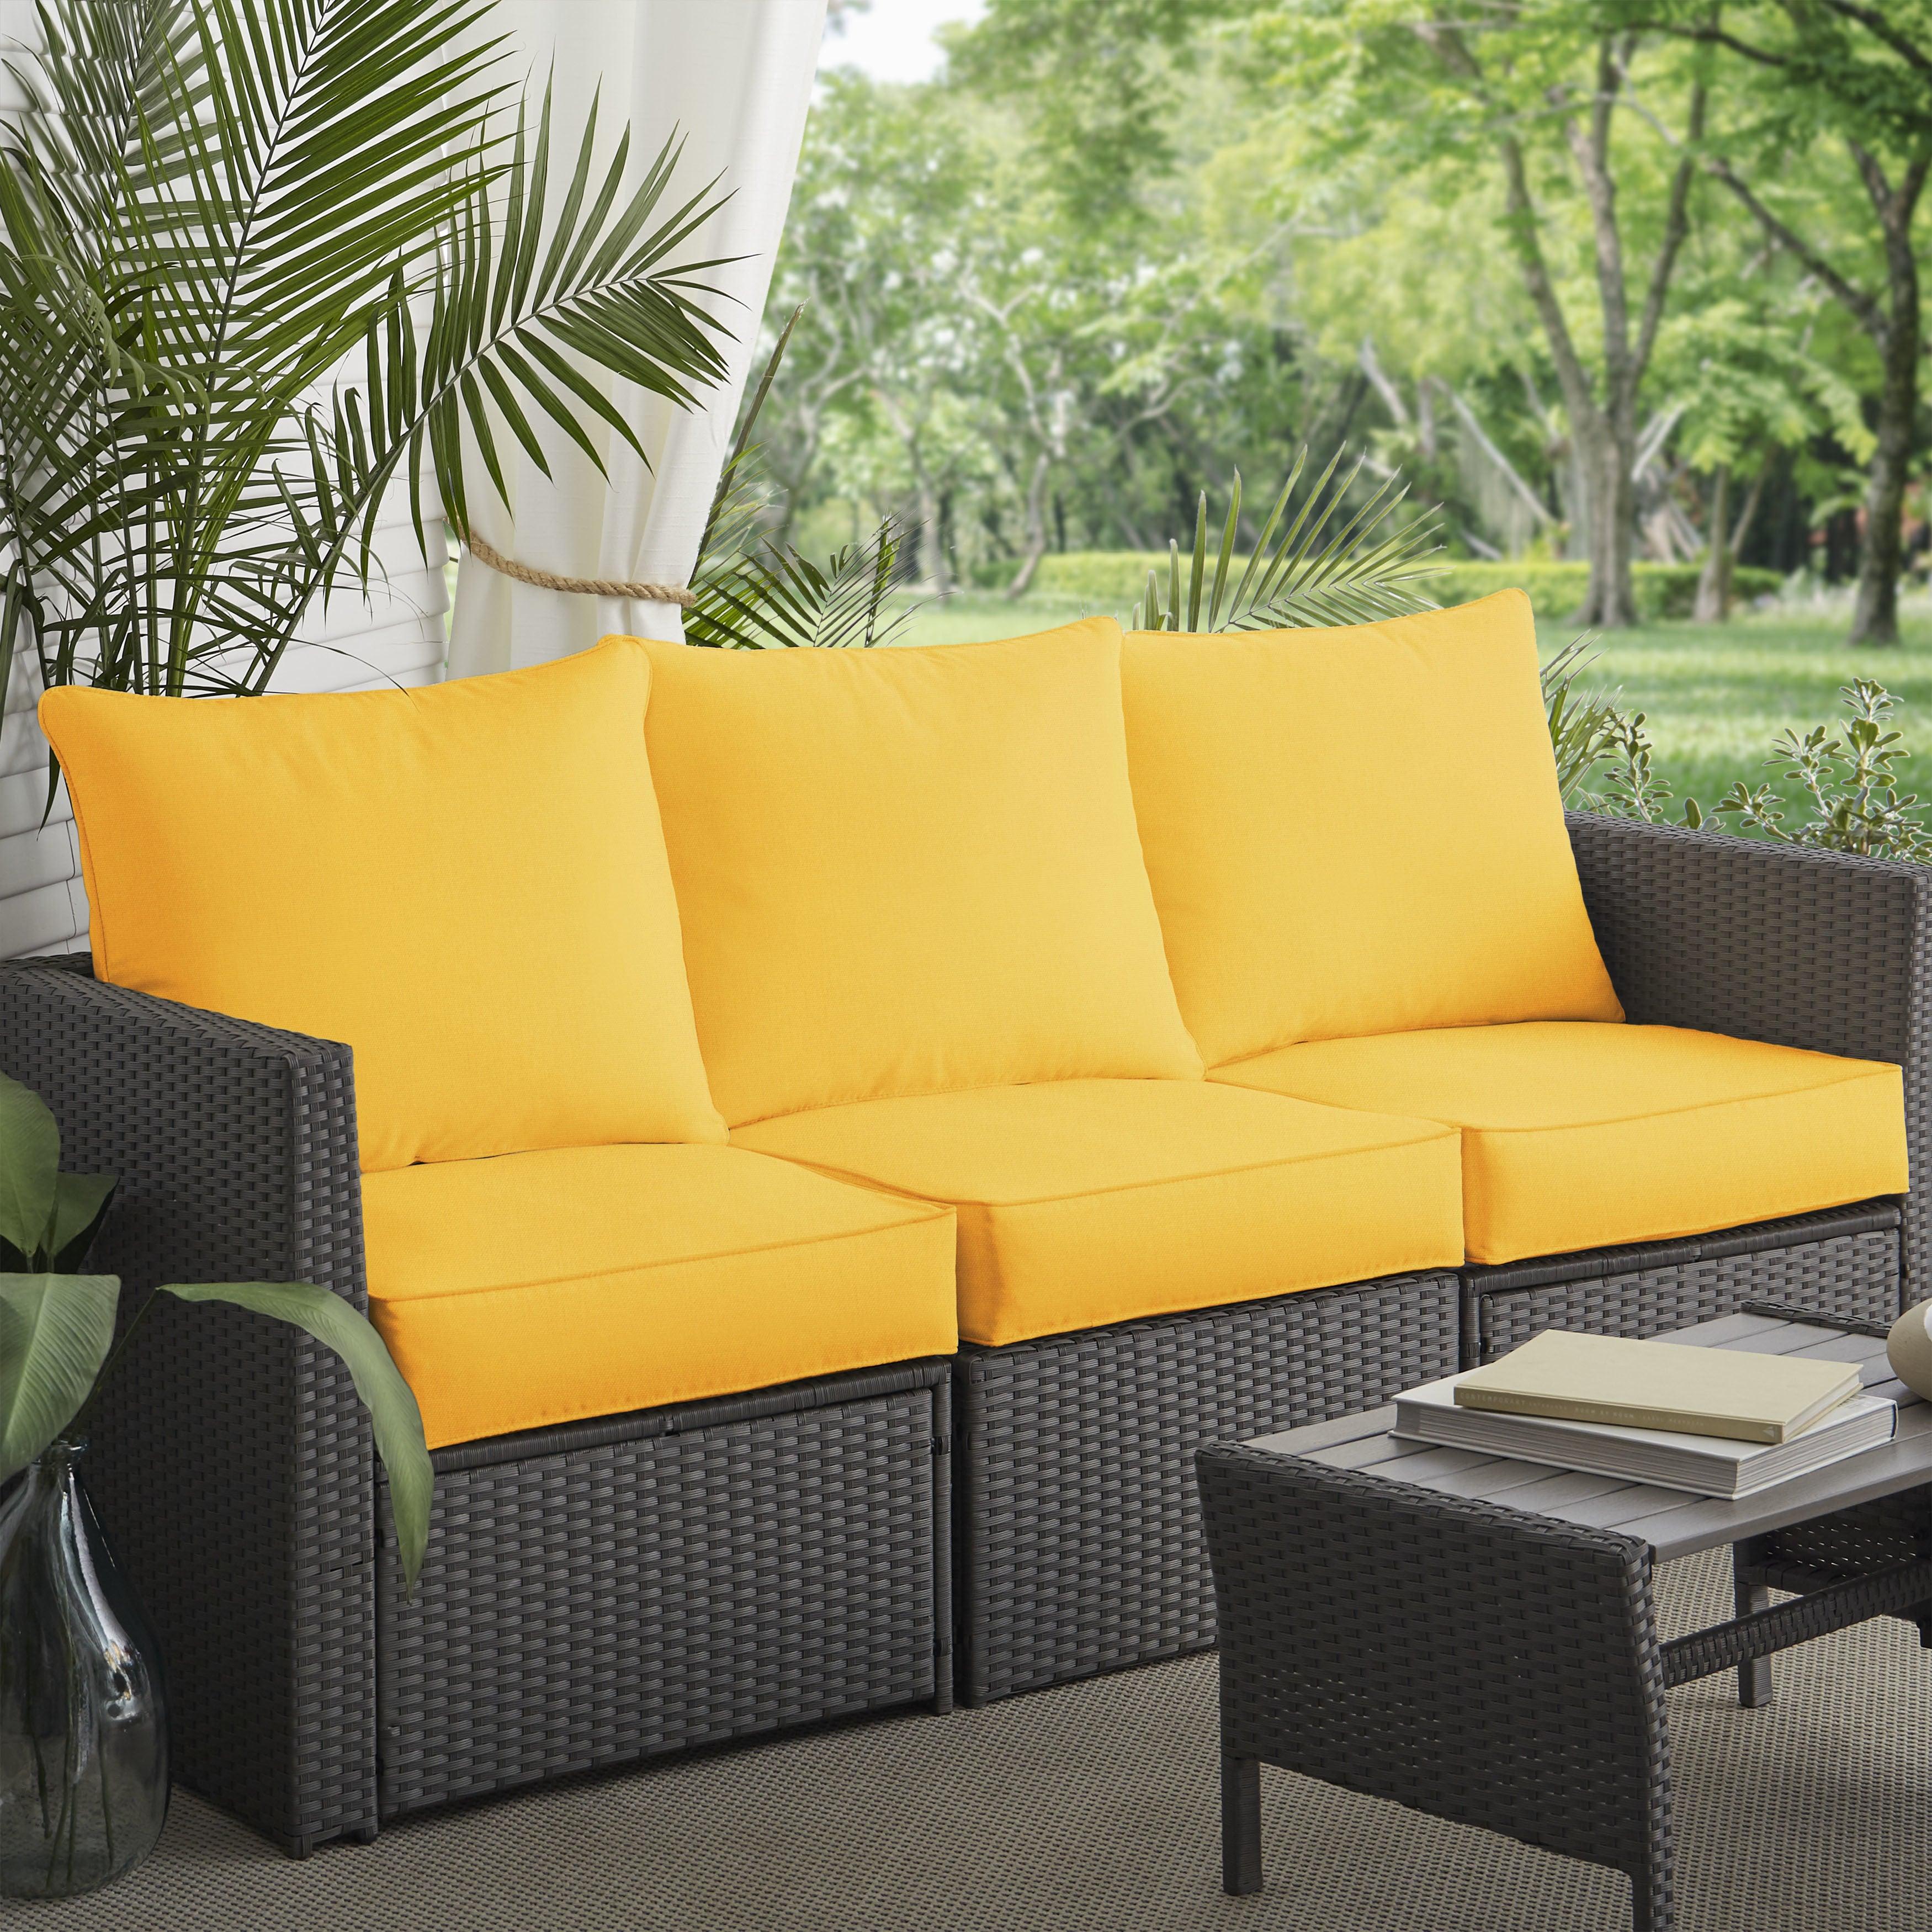 Shop Clara Indoor/ Outdoor Wicker Sofa Cushion Set made with ...